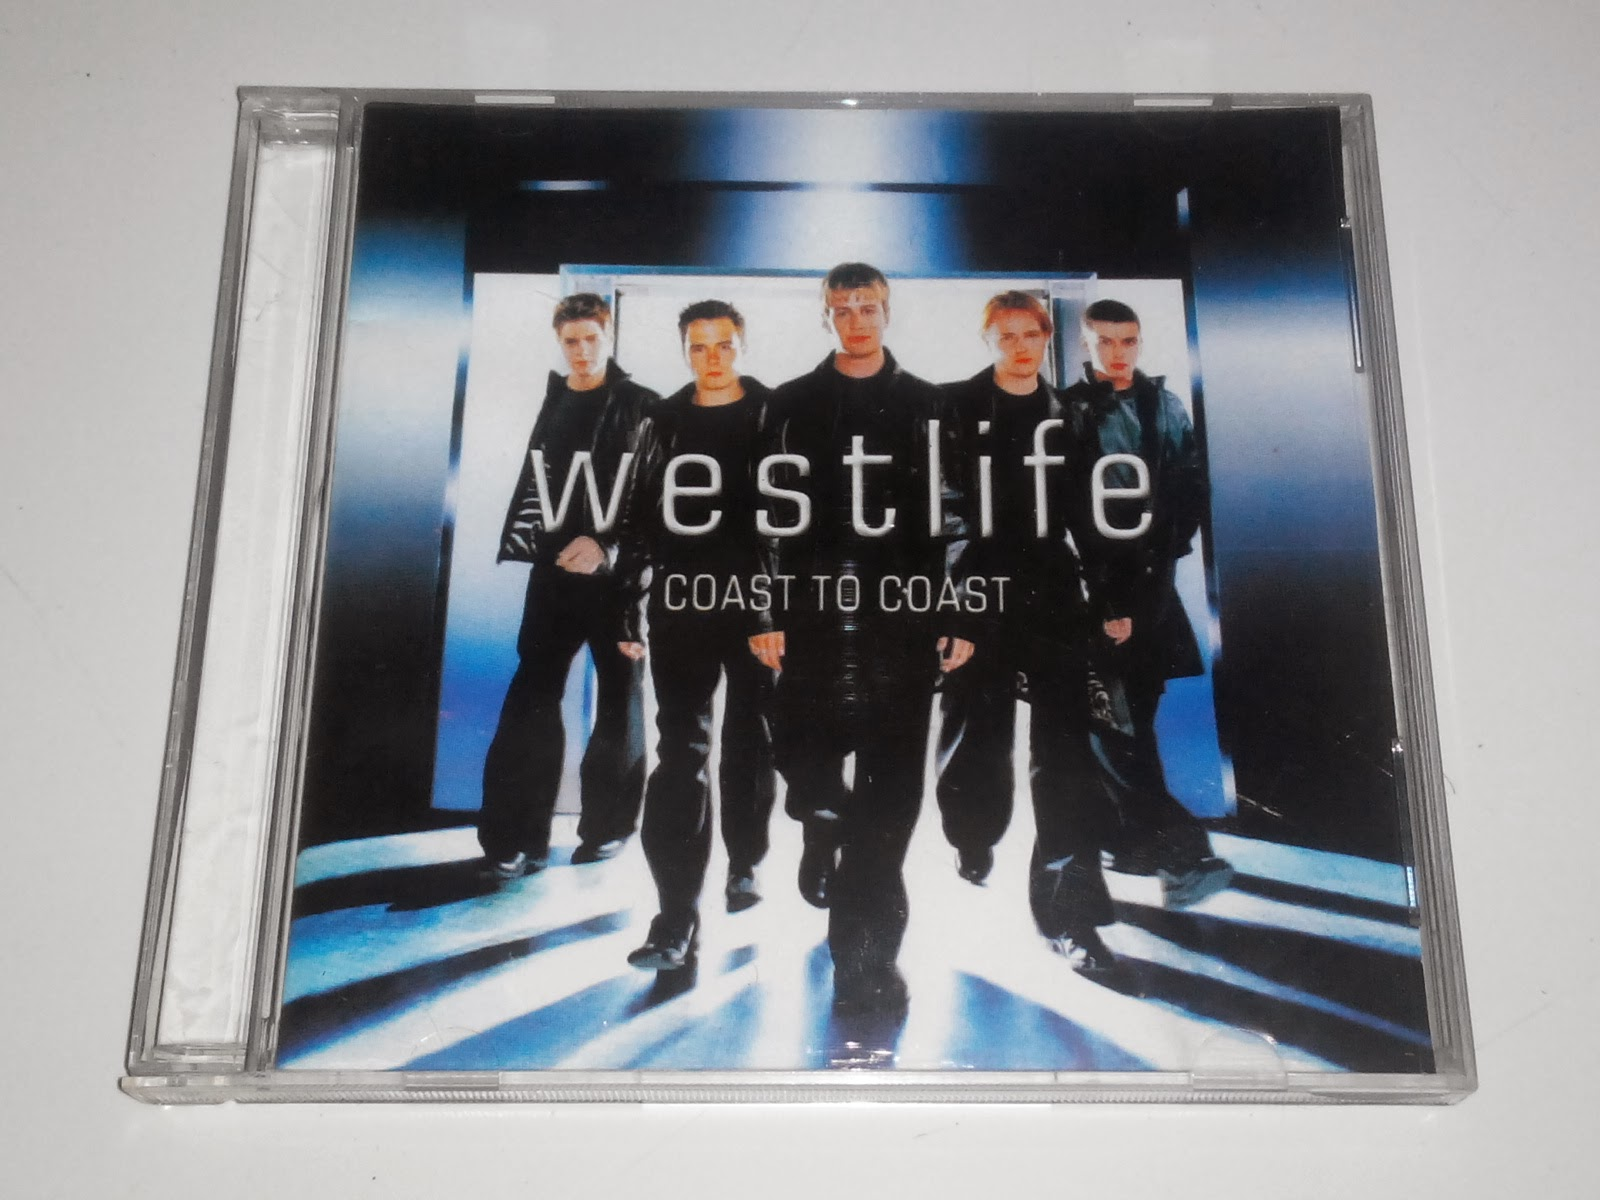 pics for gt westlife coast to coast album art